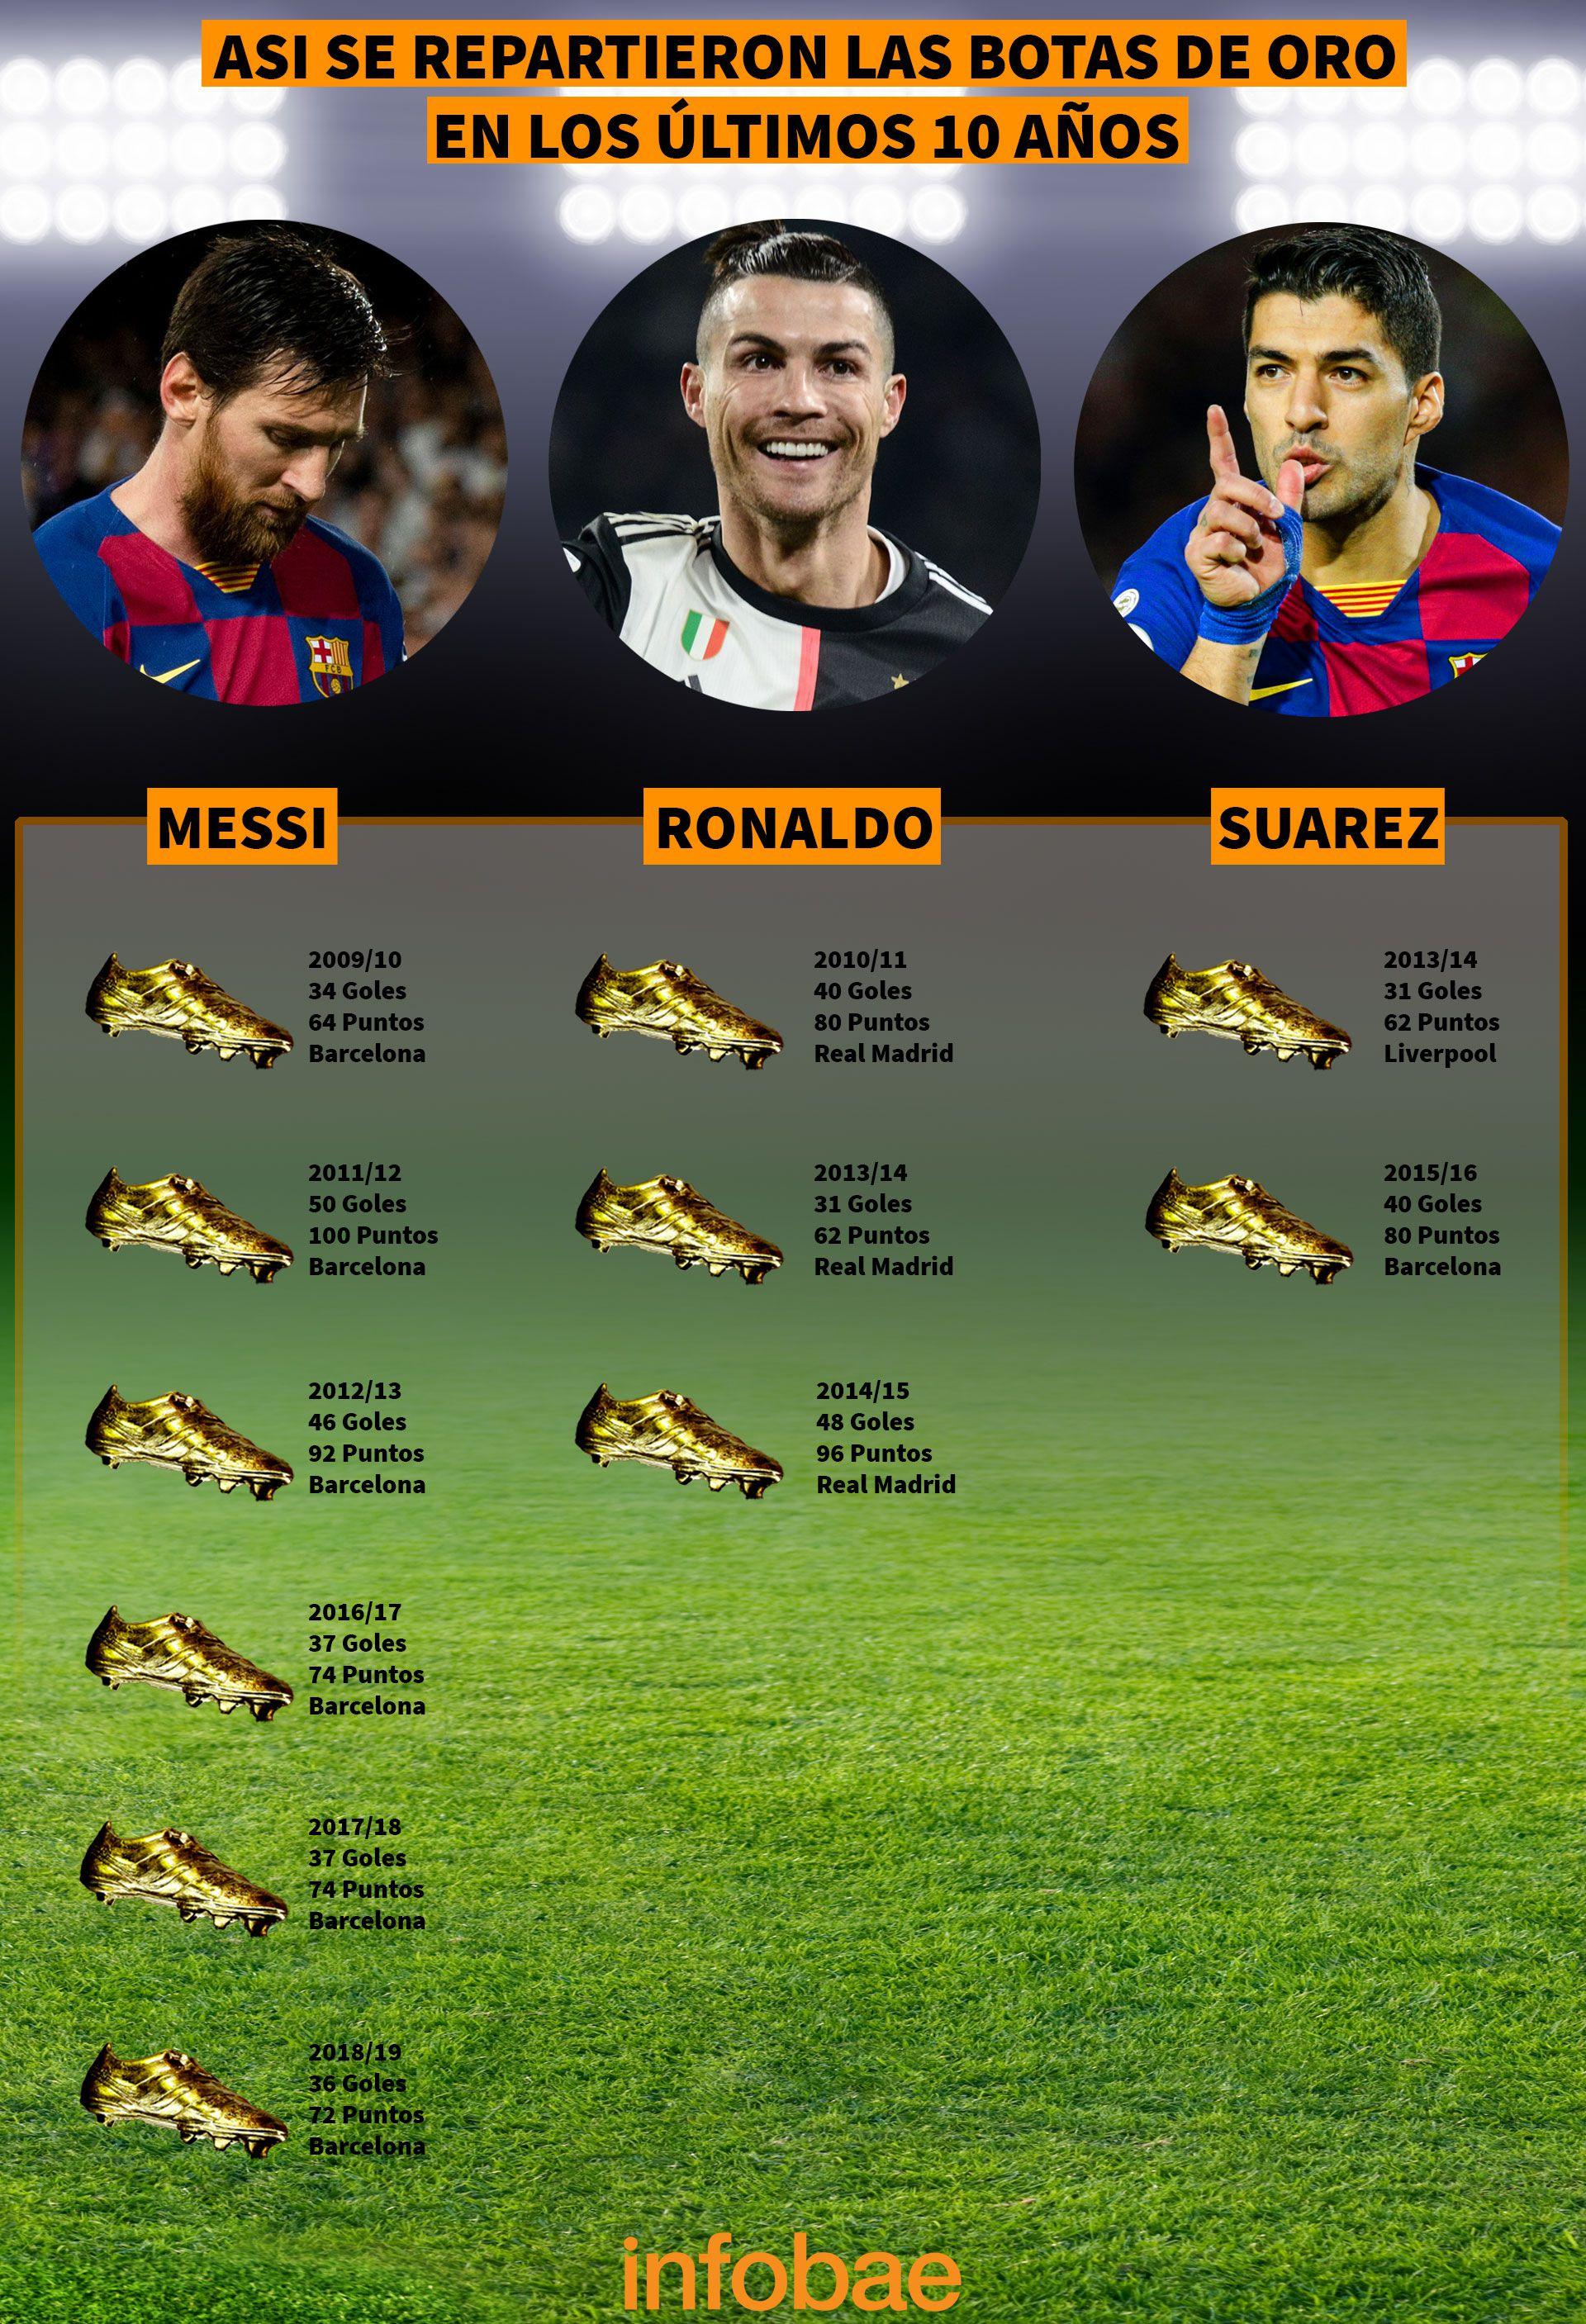 Botas de oro Messi Ronaldo Suarez